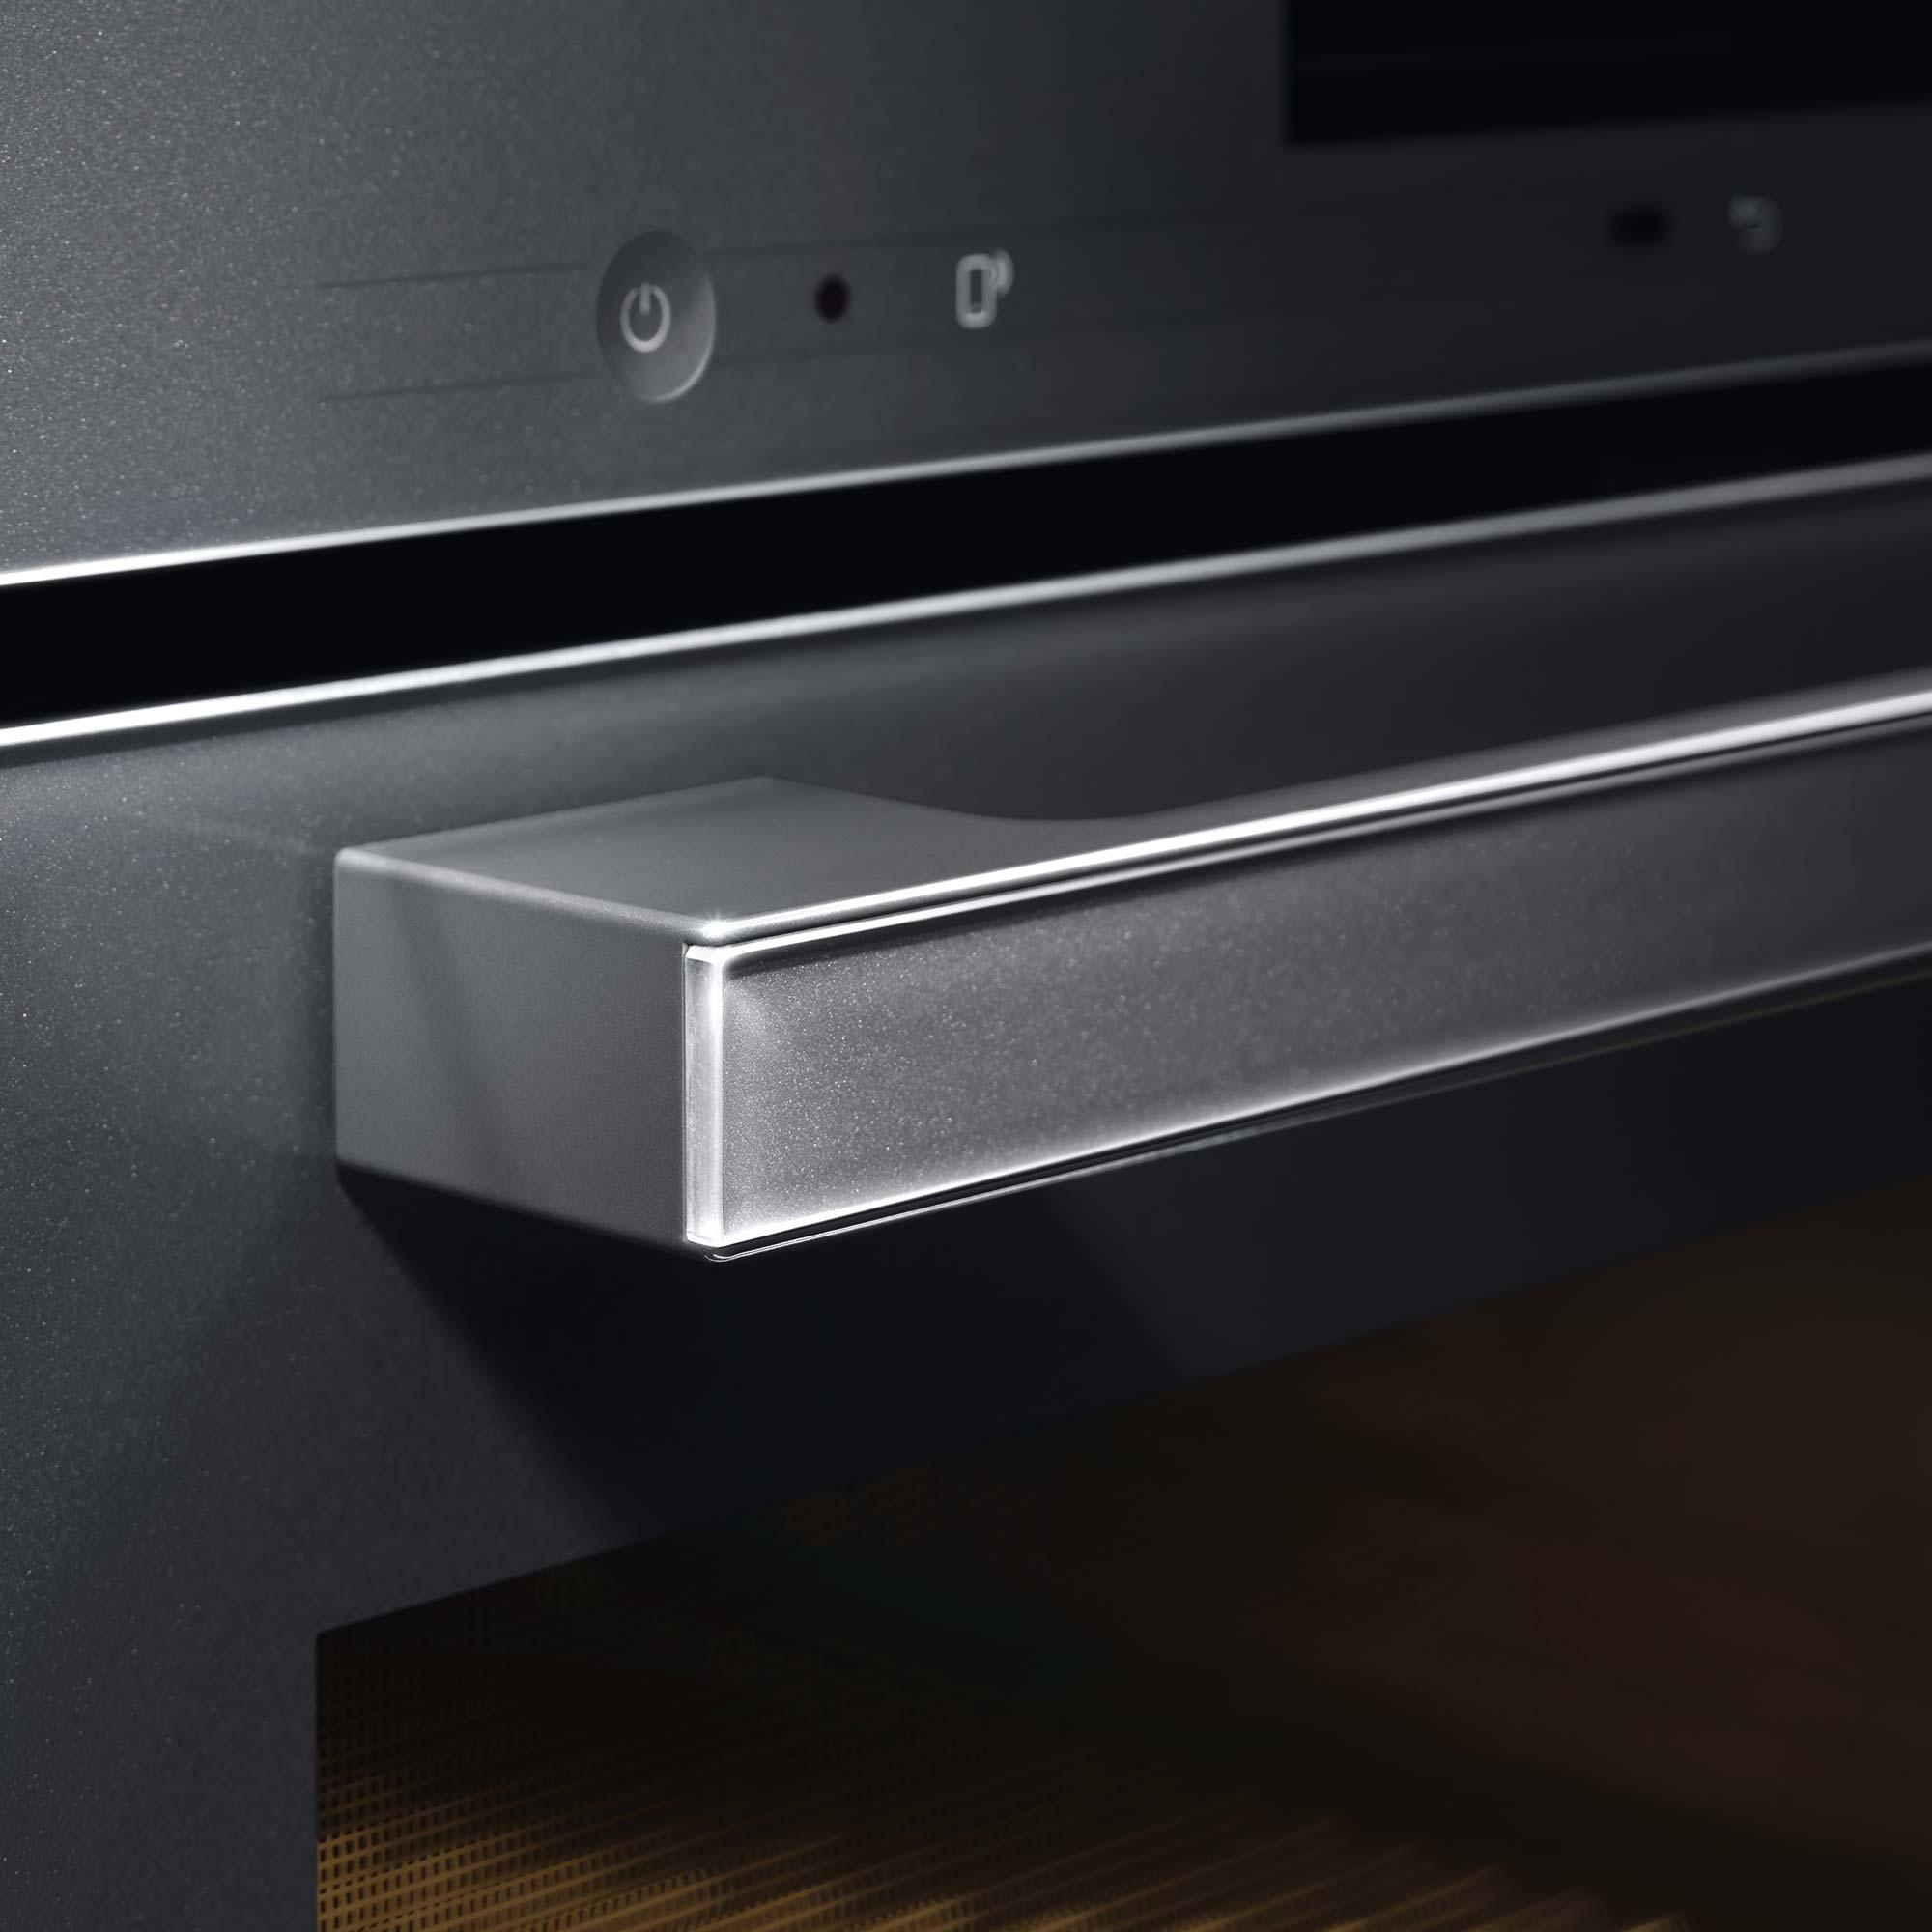 Miele kitchen appliance handle detail